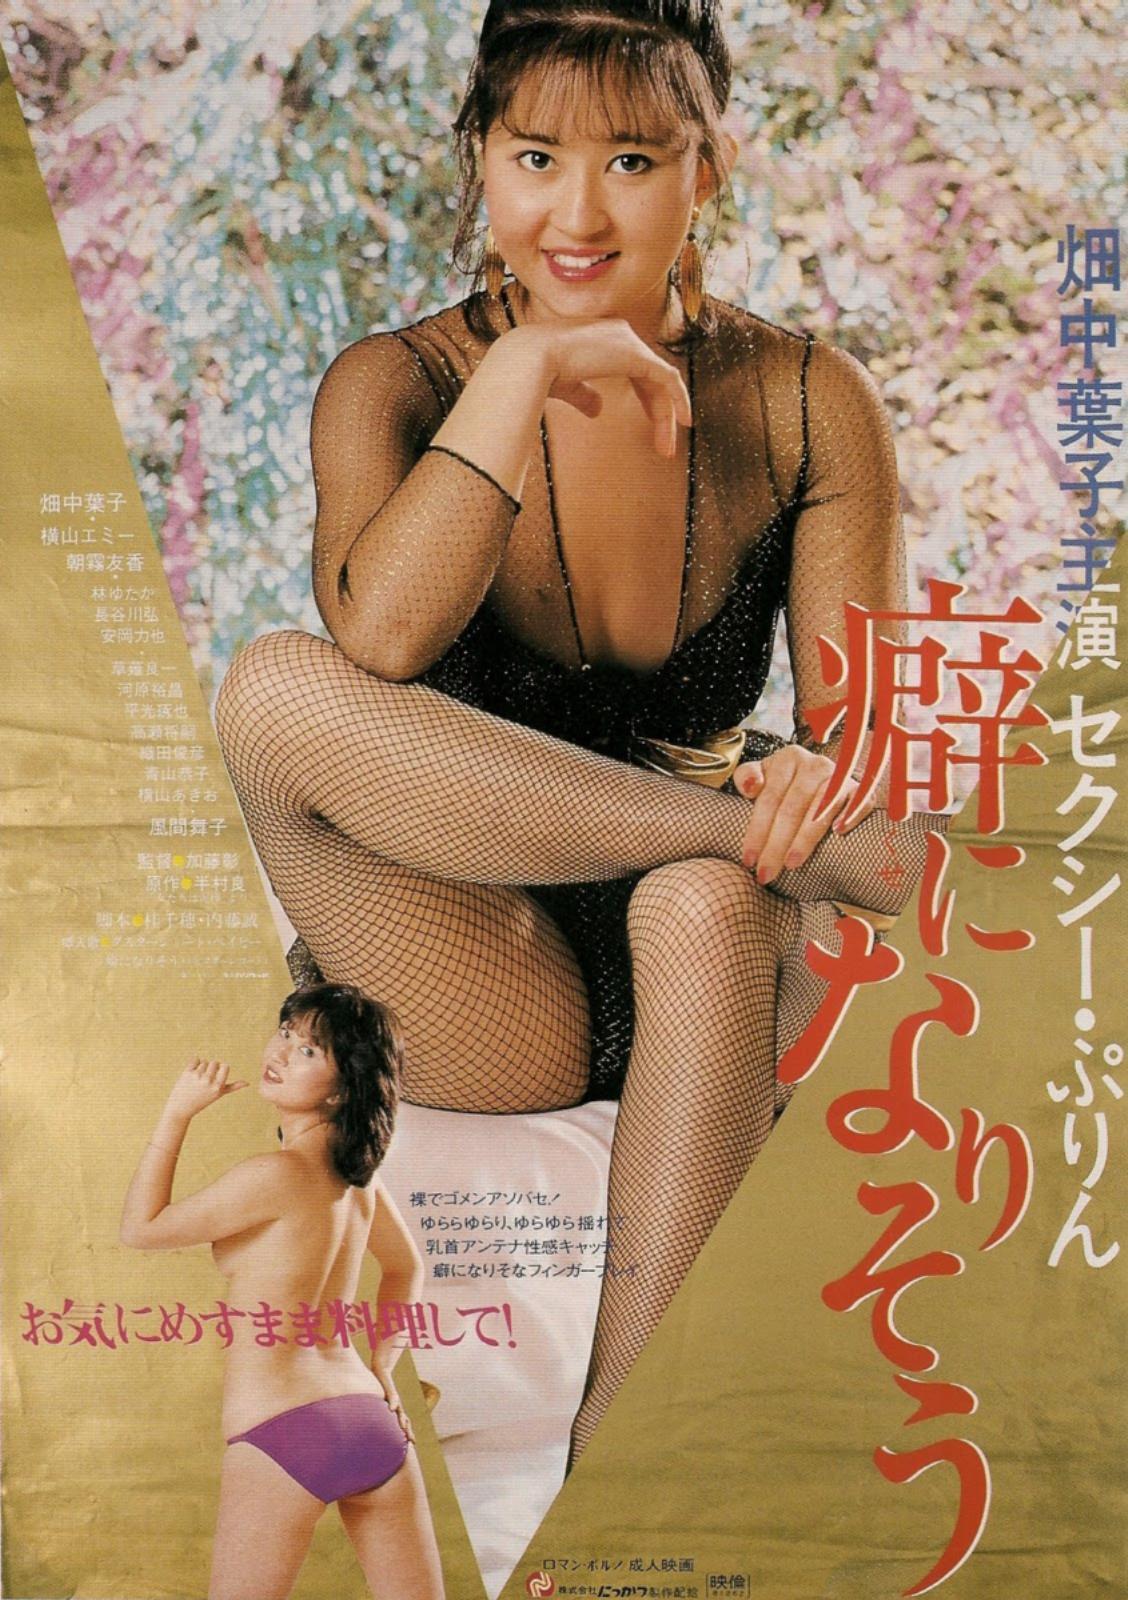 Angel Guts Red Porno-Tenshi No Harawata Akai Inga 1981 dekkappai's pre-1990 pink film archive: 2001